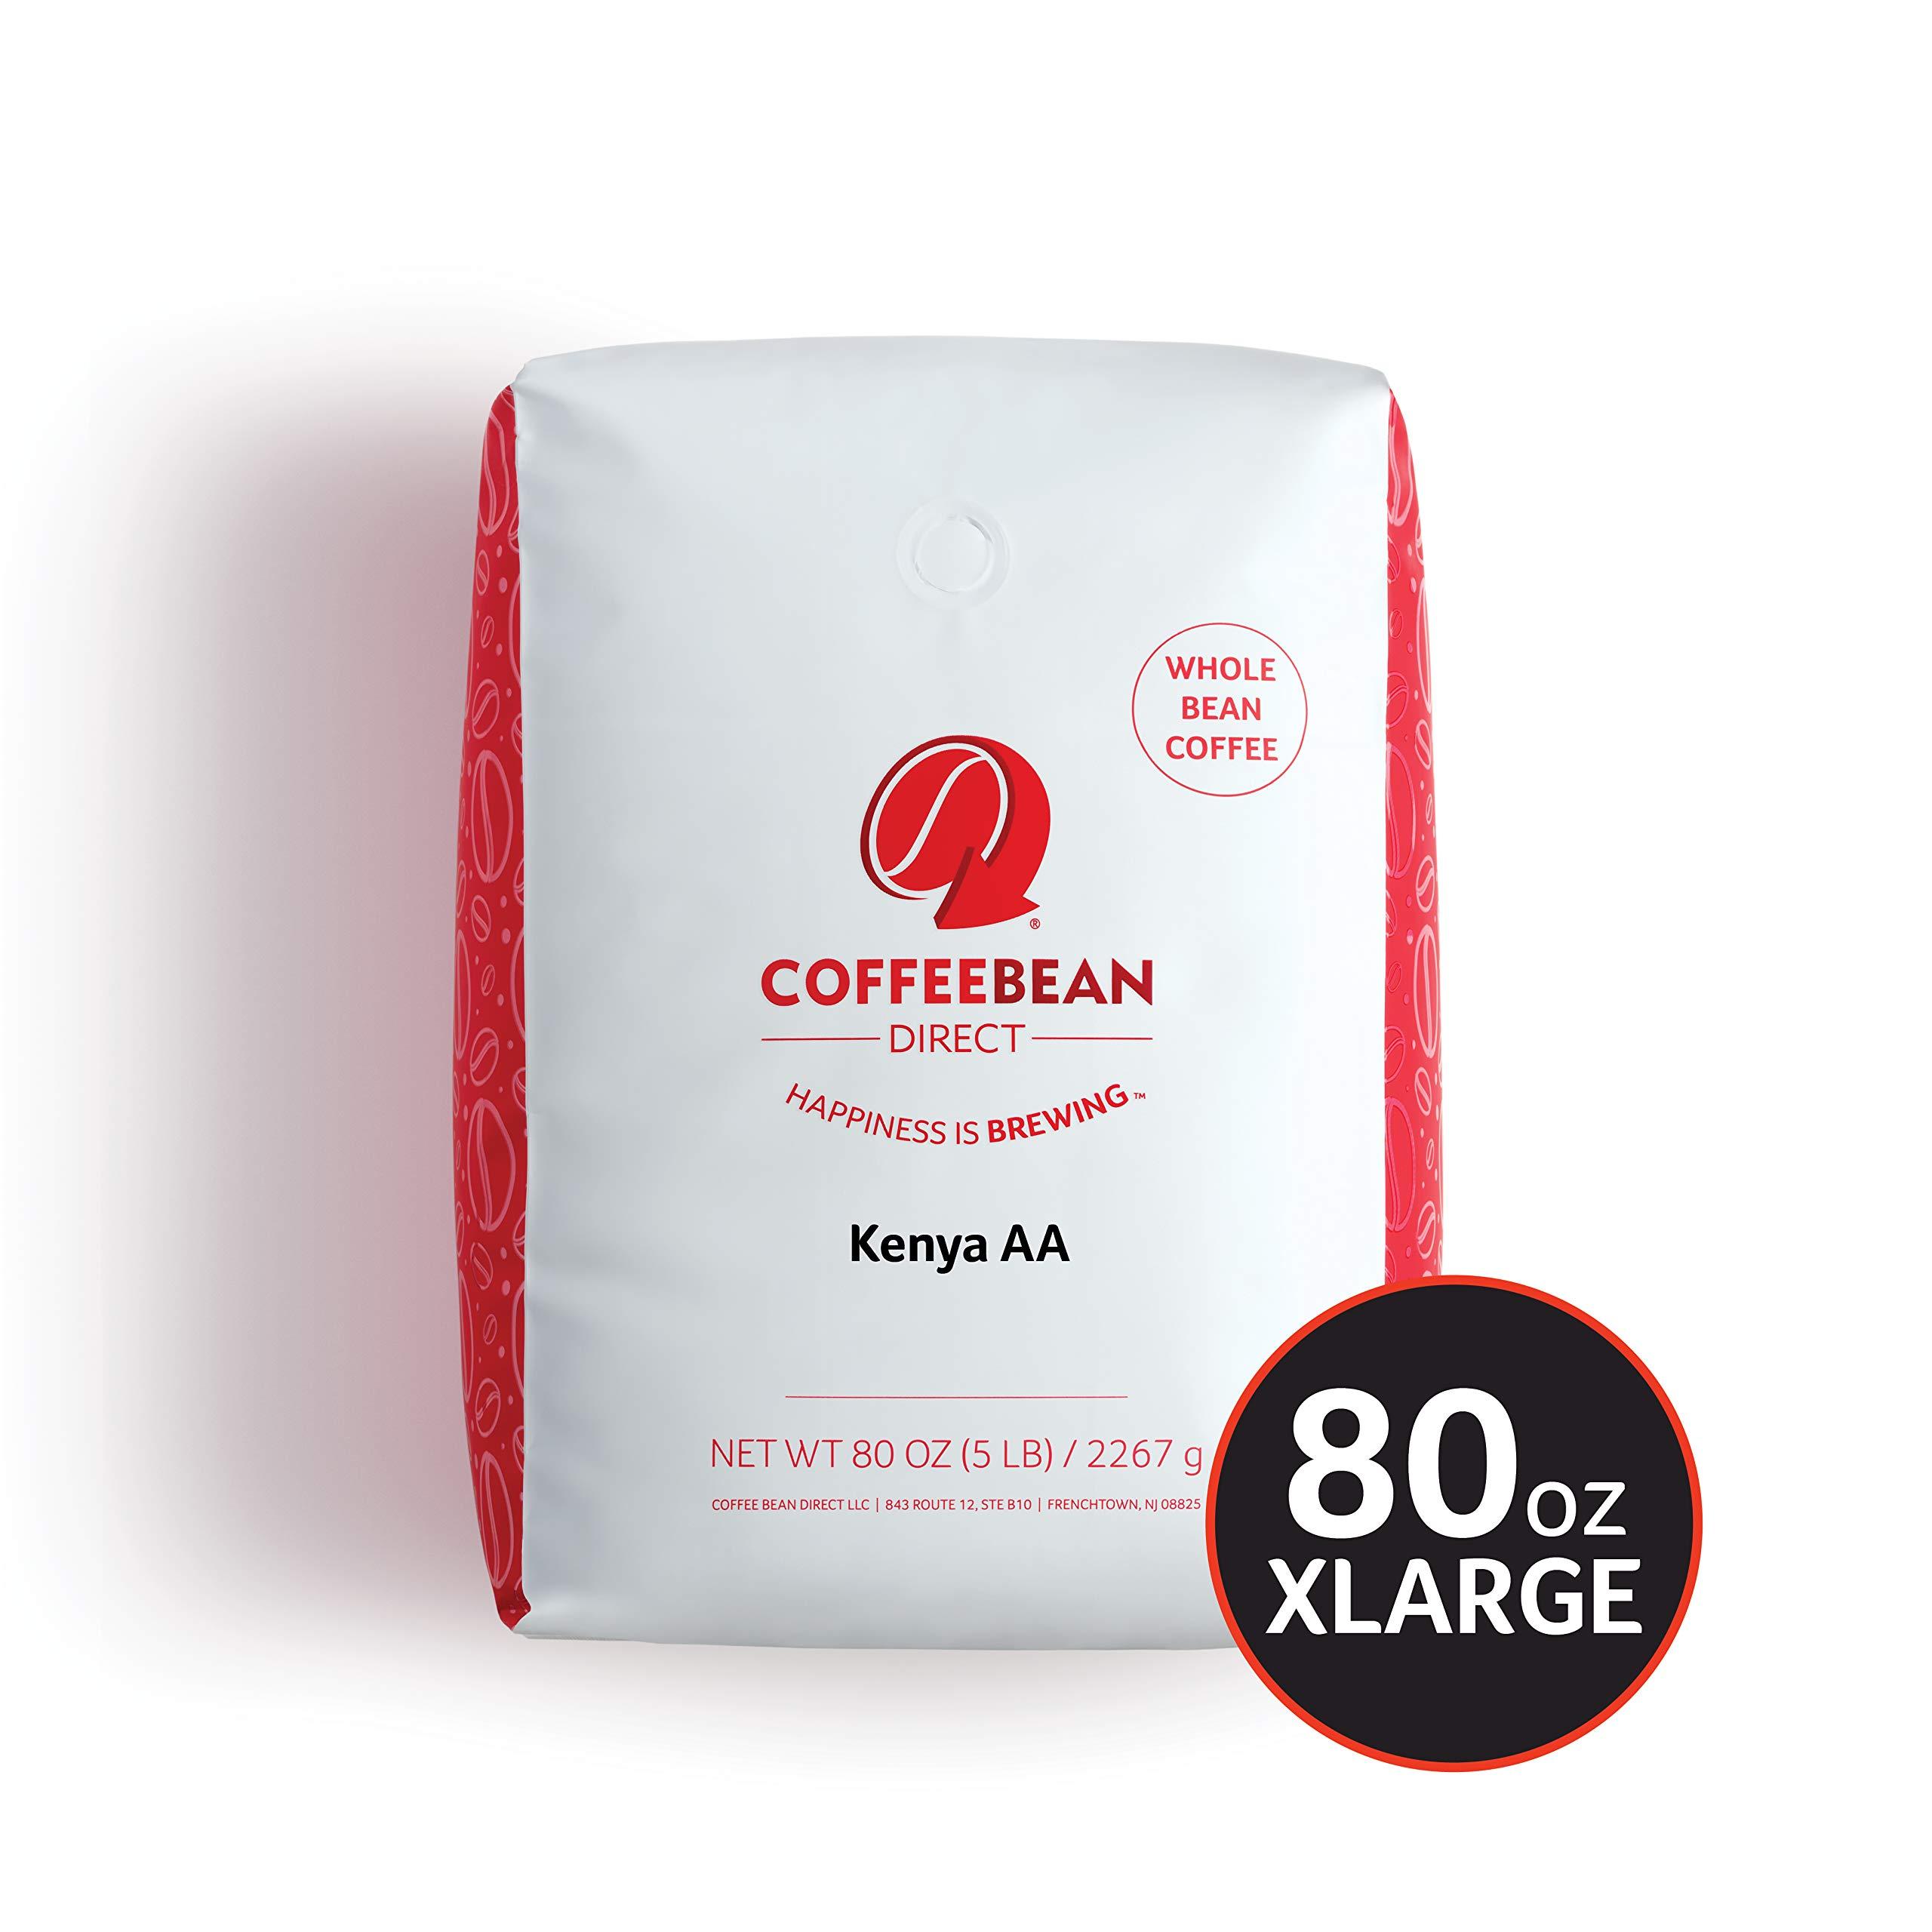 Coffee Bean Direct Kenya AA, Whole Bean Coffee, 5-Pound Bag by Coffee Bean Direct